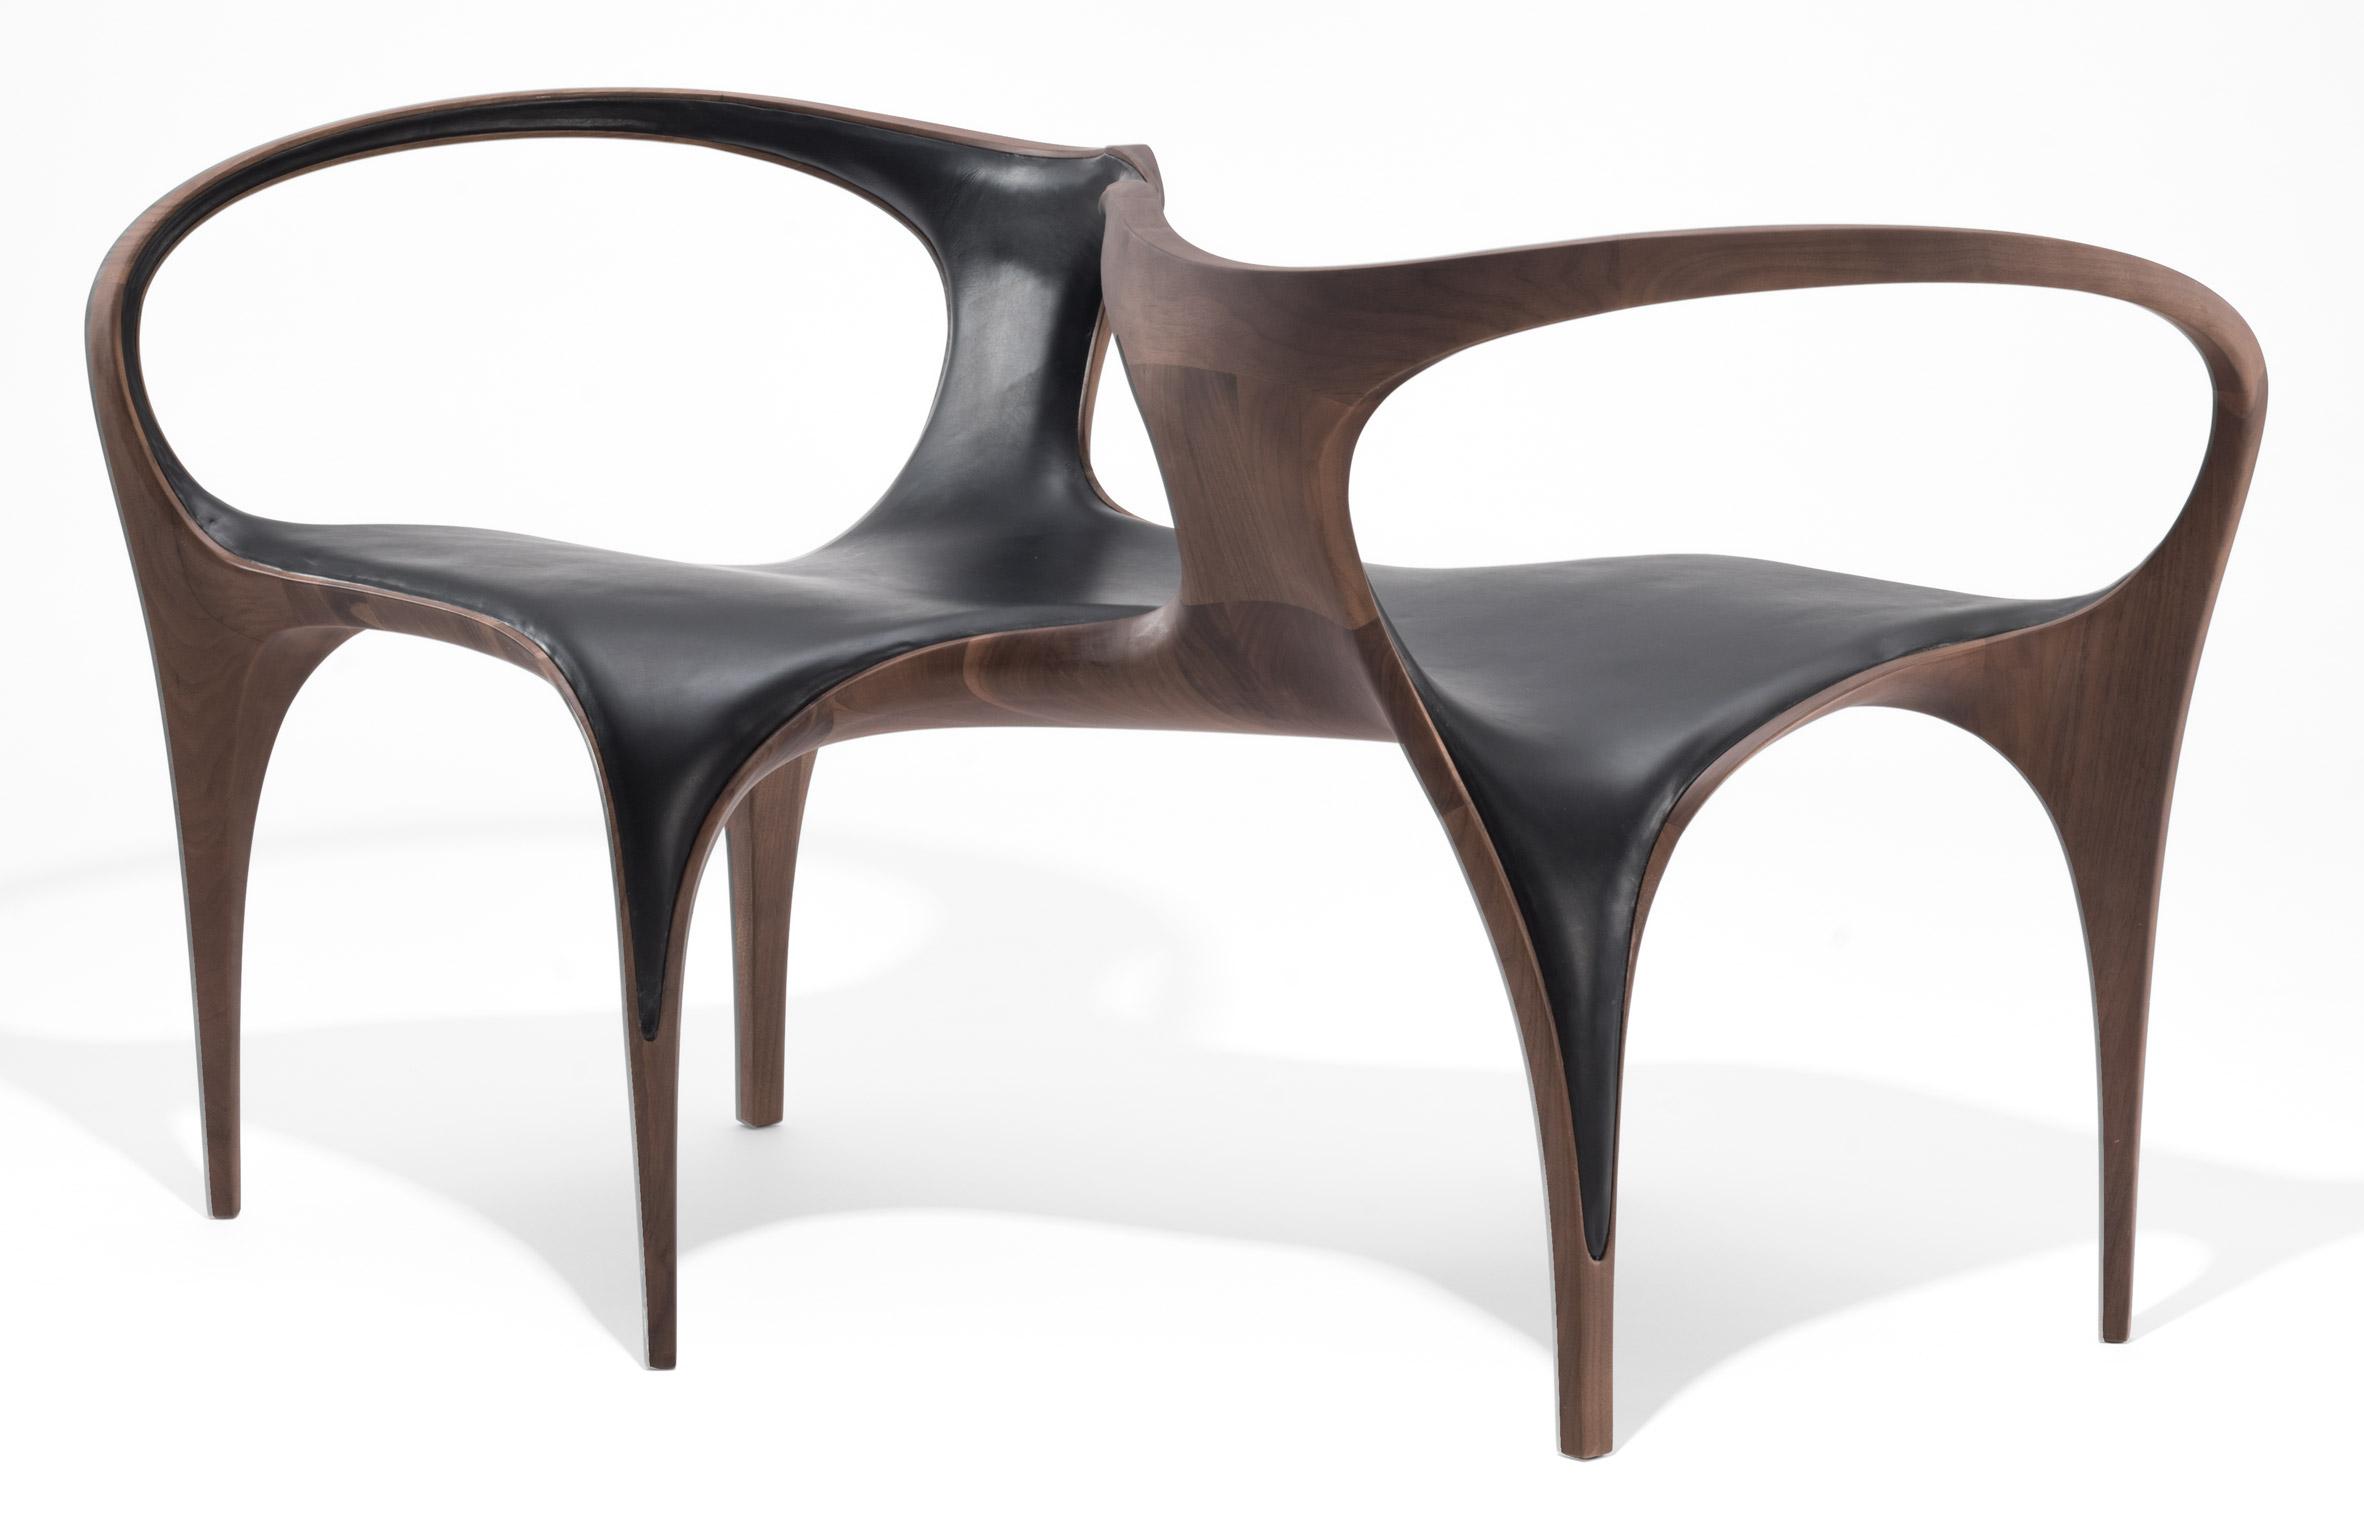 ultrastellar-zaha-hadid-furniture-collection-david-gill-gallery-wood-leather_dezeen_2364_col_0.jpg